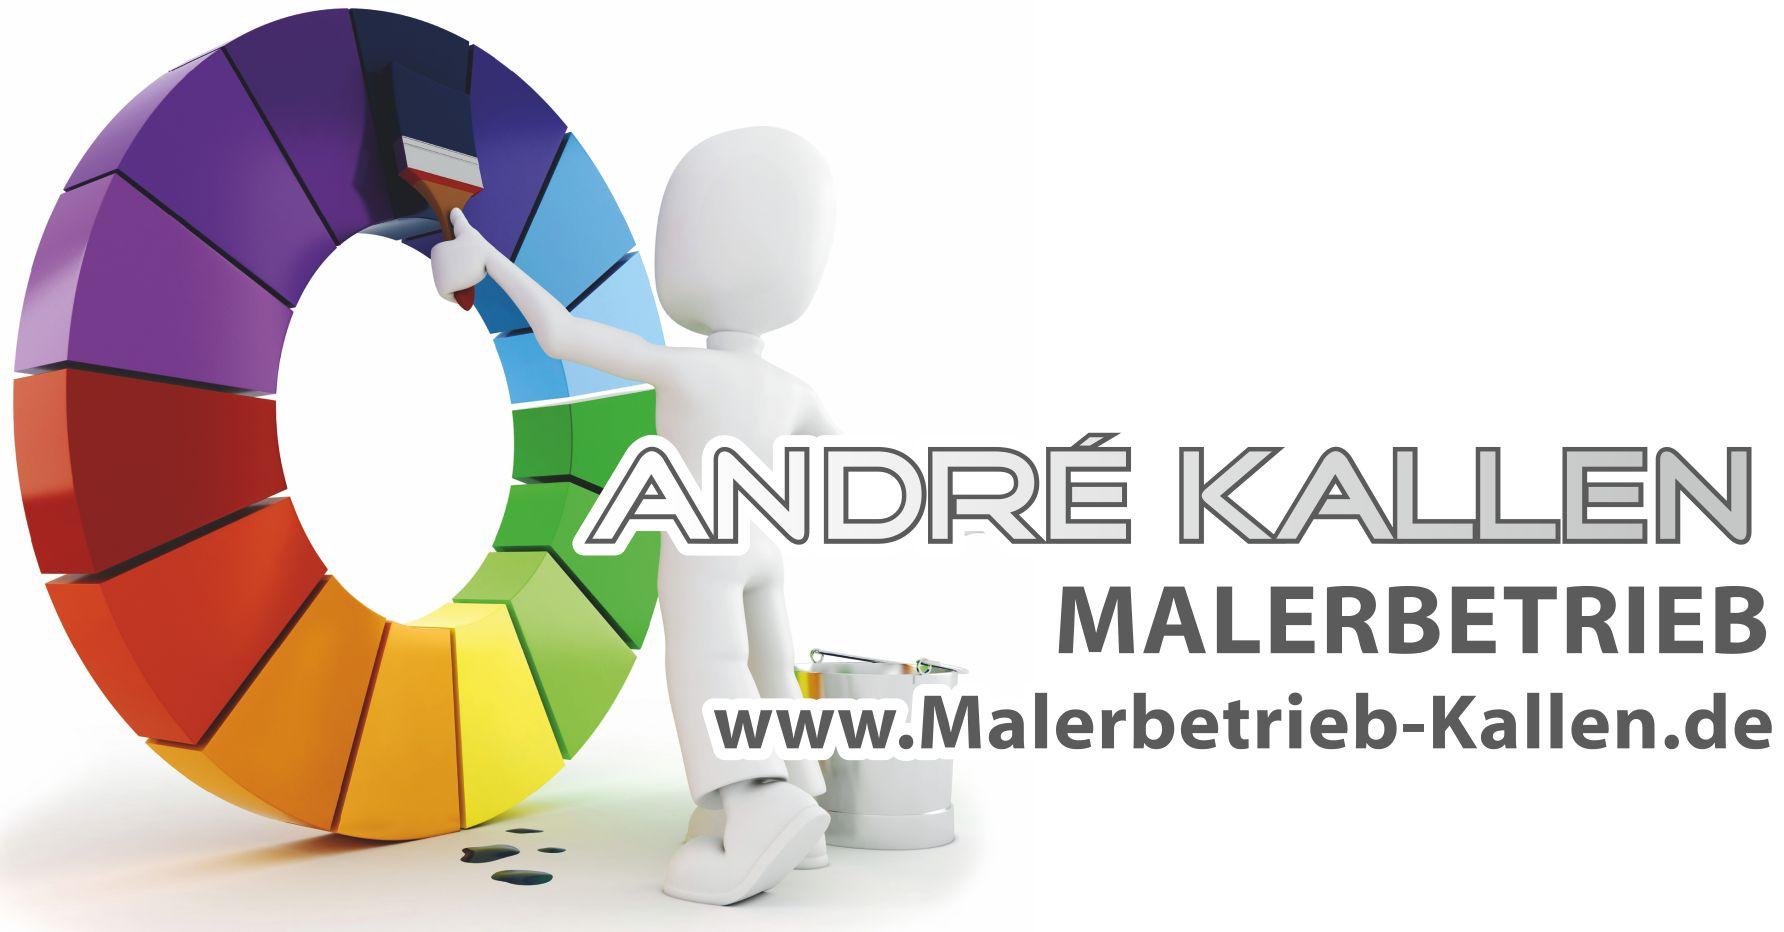 Malerbetrieb Andre Kallen